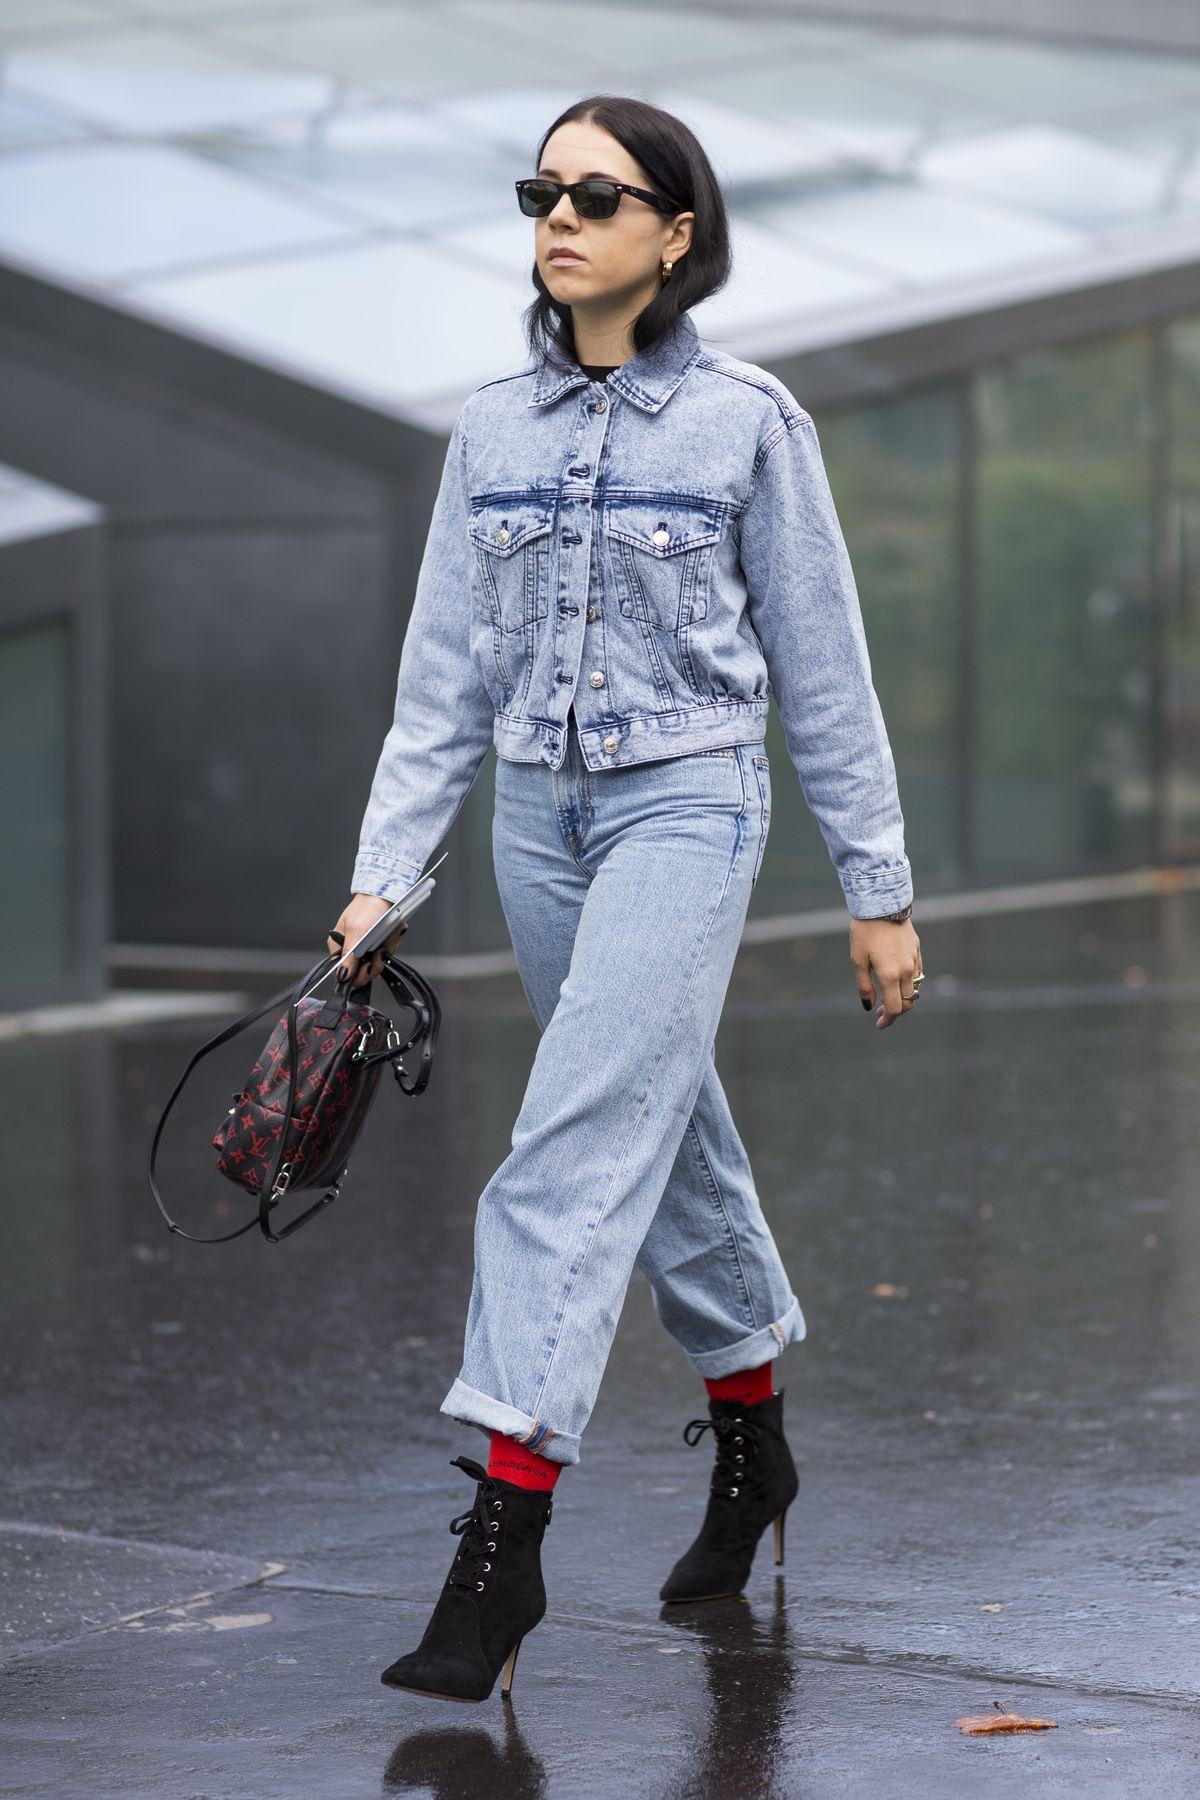 Denim Fashion Inspiration From Instagram | The Jeans Blog